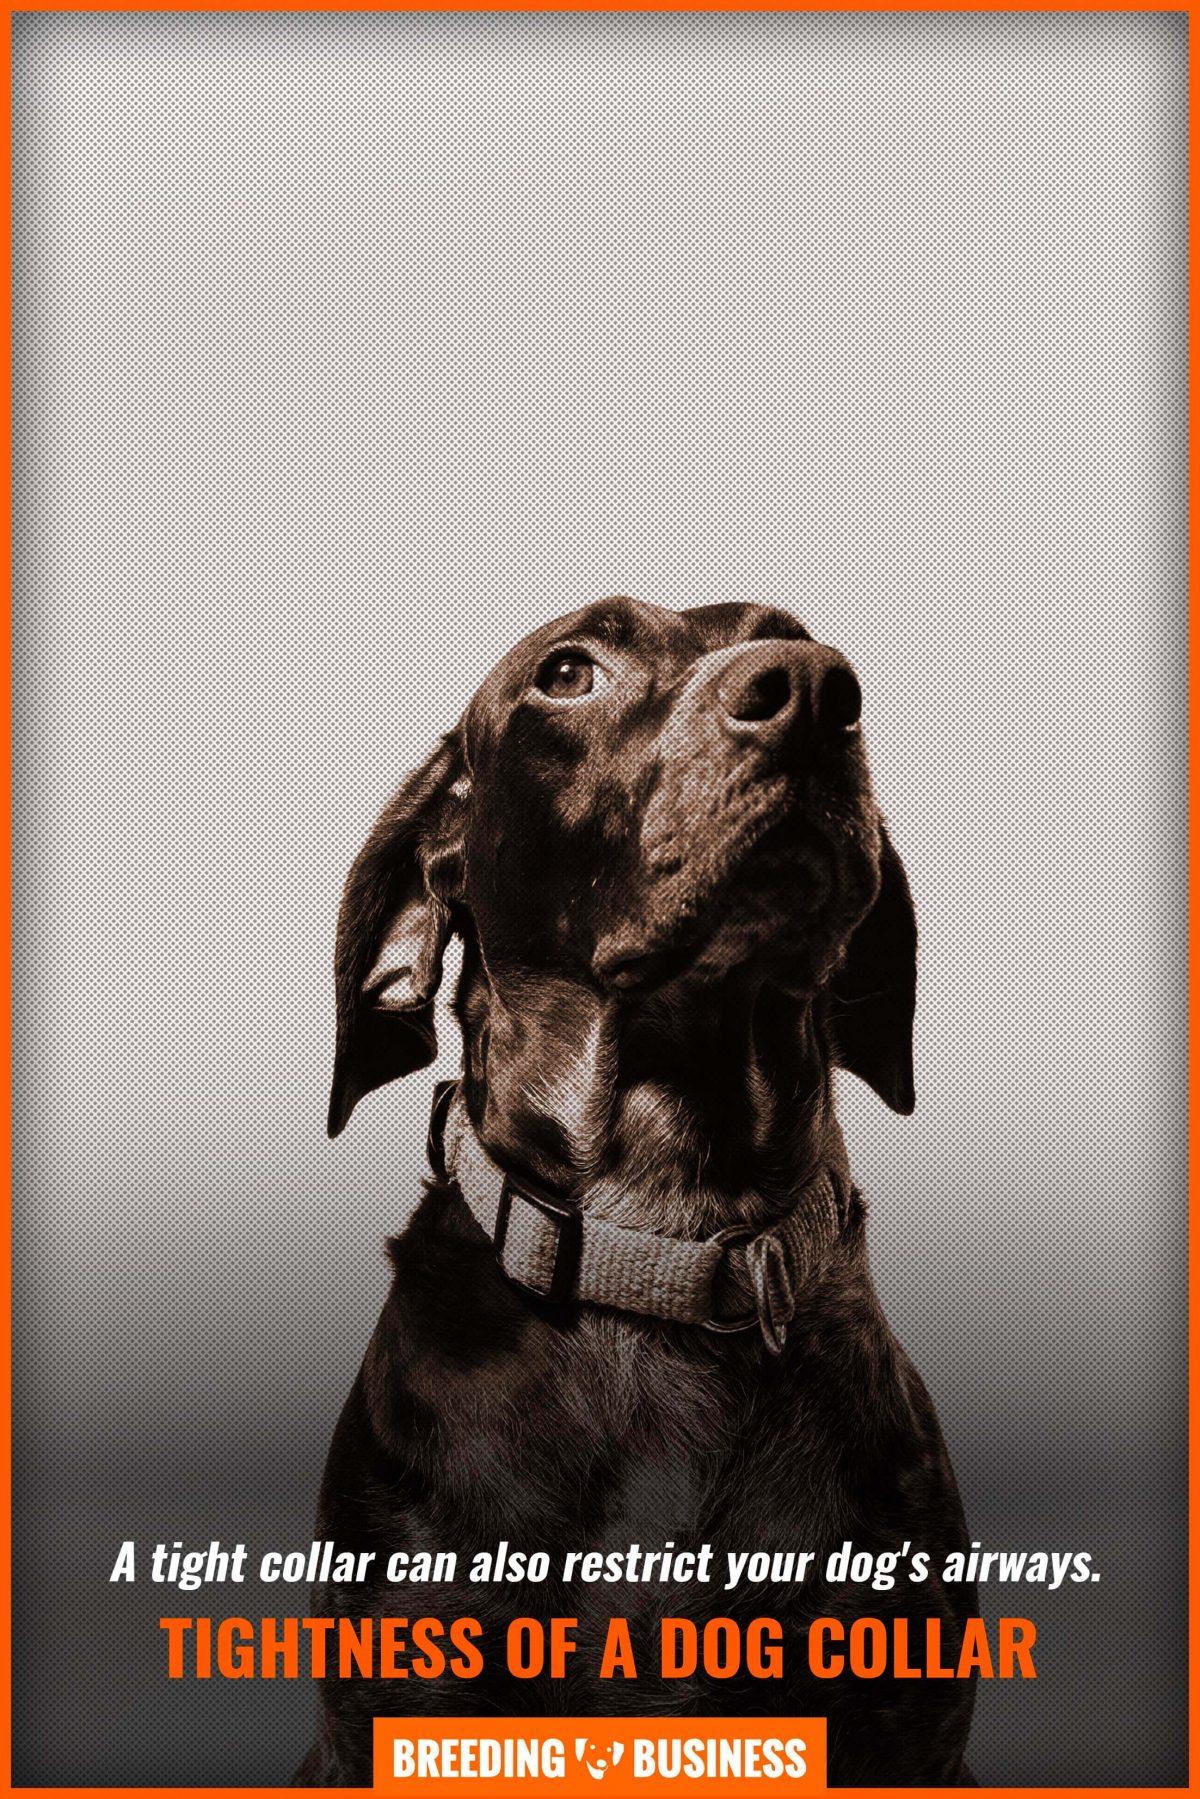 tightness of a dog collar